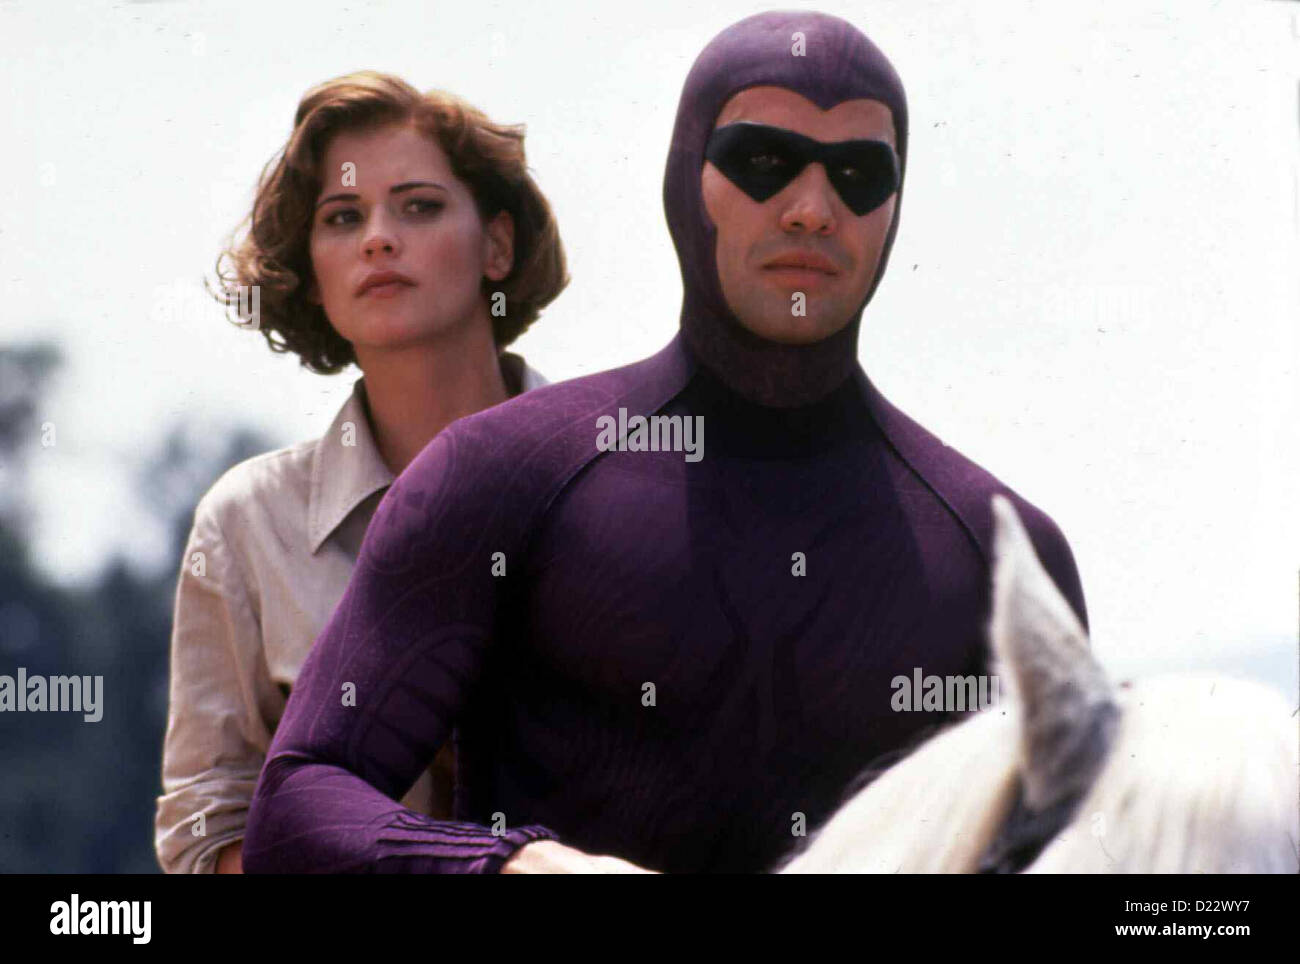 Das Phantom   Phantom, The   Diana Palmer (Kristy Swanson), Phantom/Kit Walker (Billy Zane) *** Local Caption *** - Stock Image